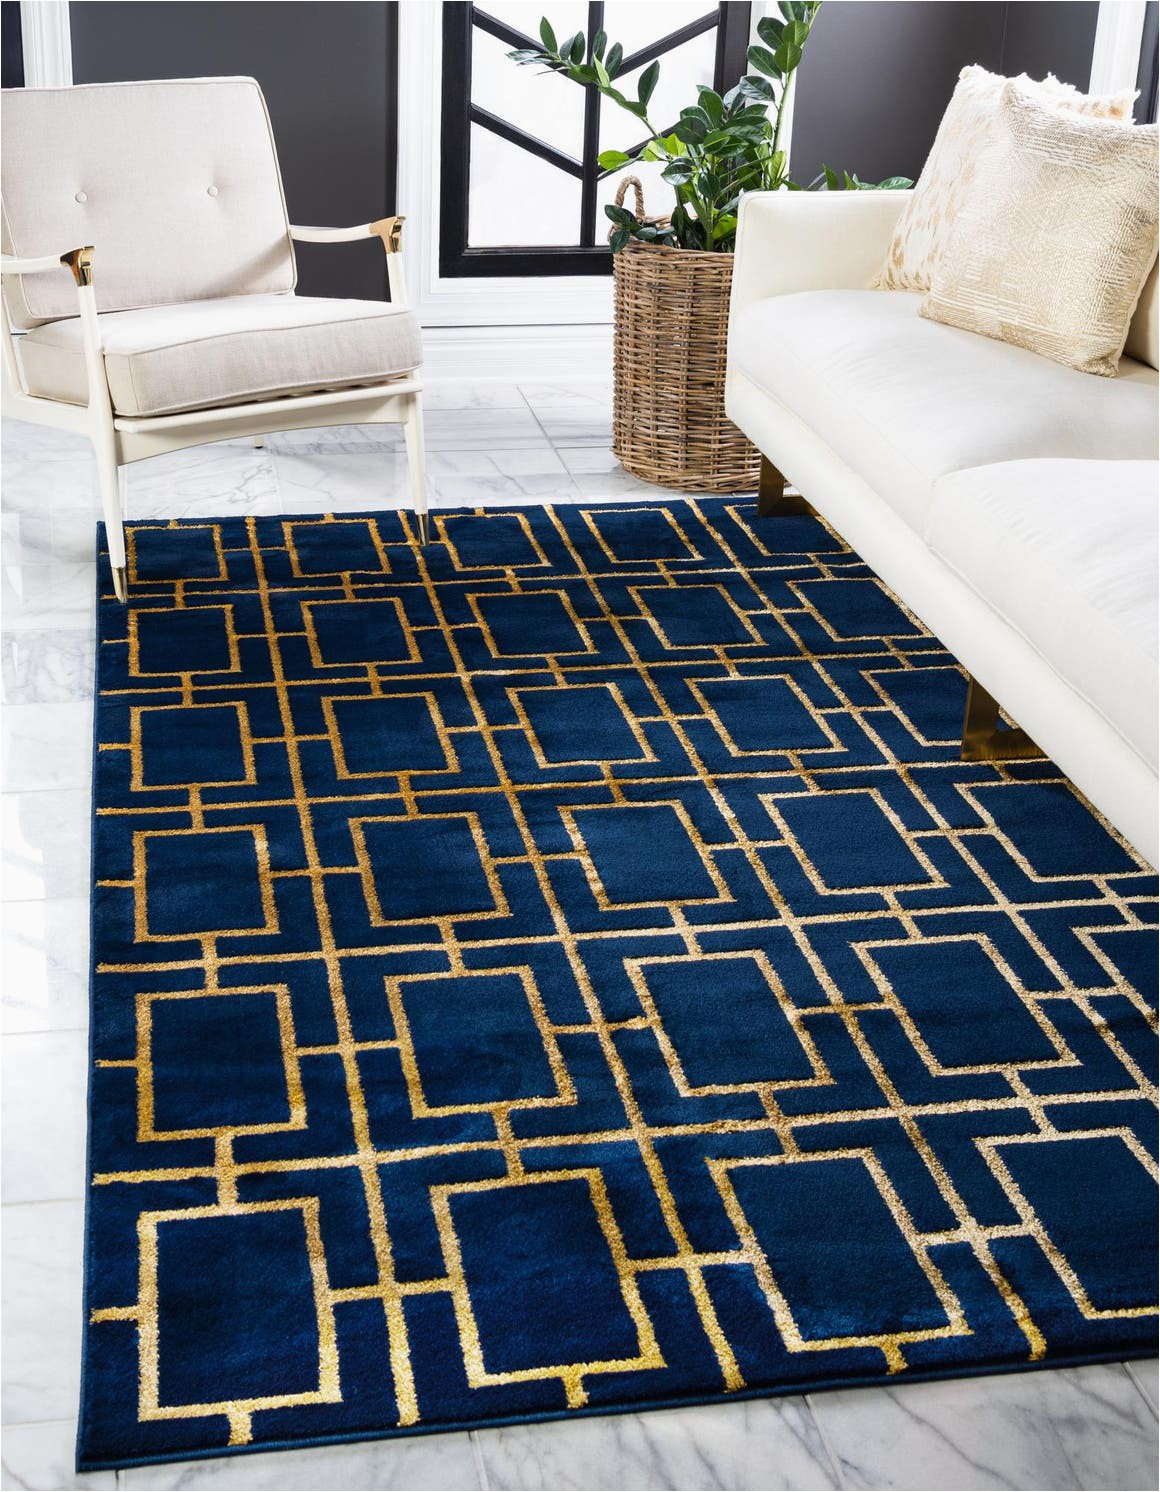 navy blue gold 4x6 marilyn monroe area rug